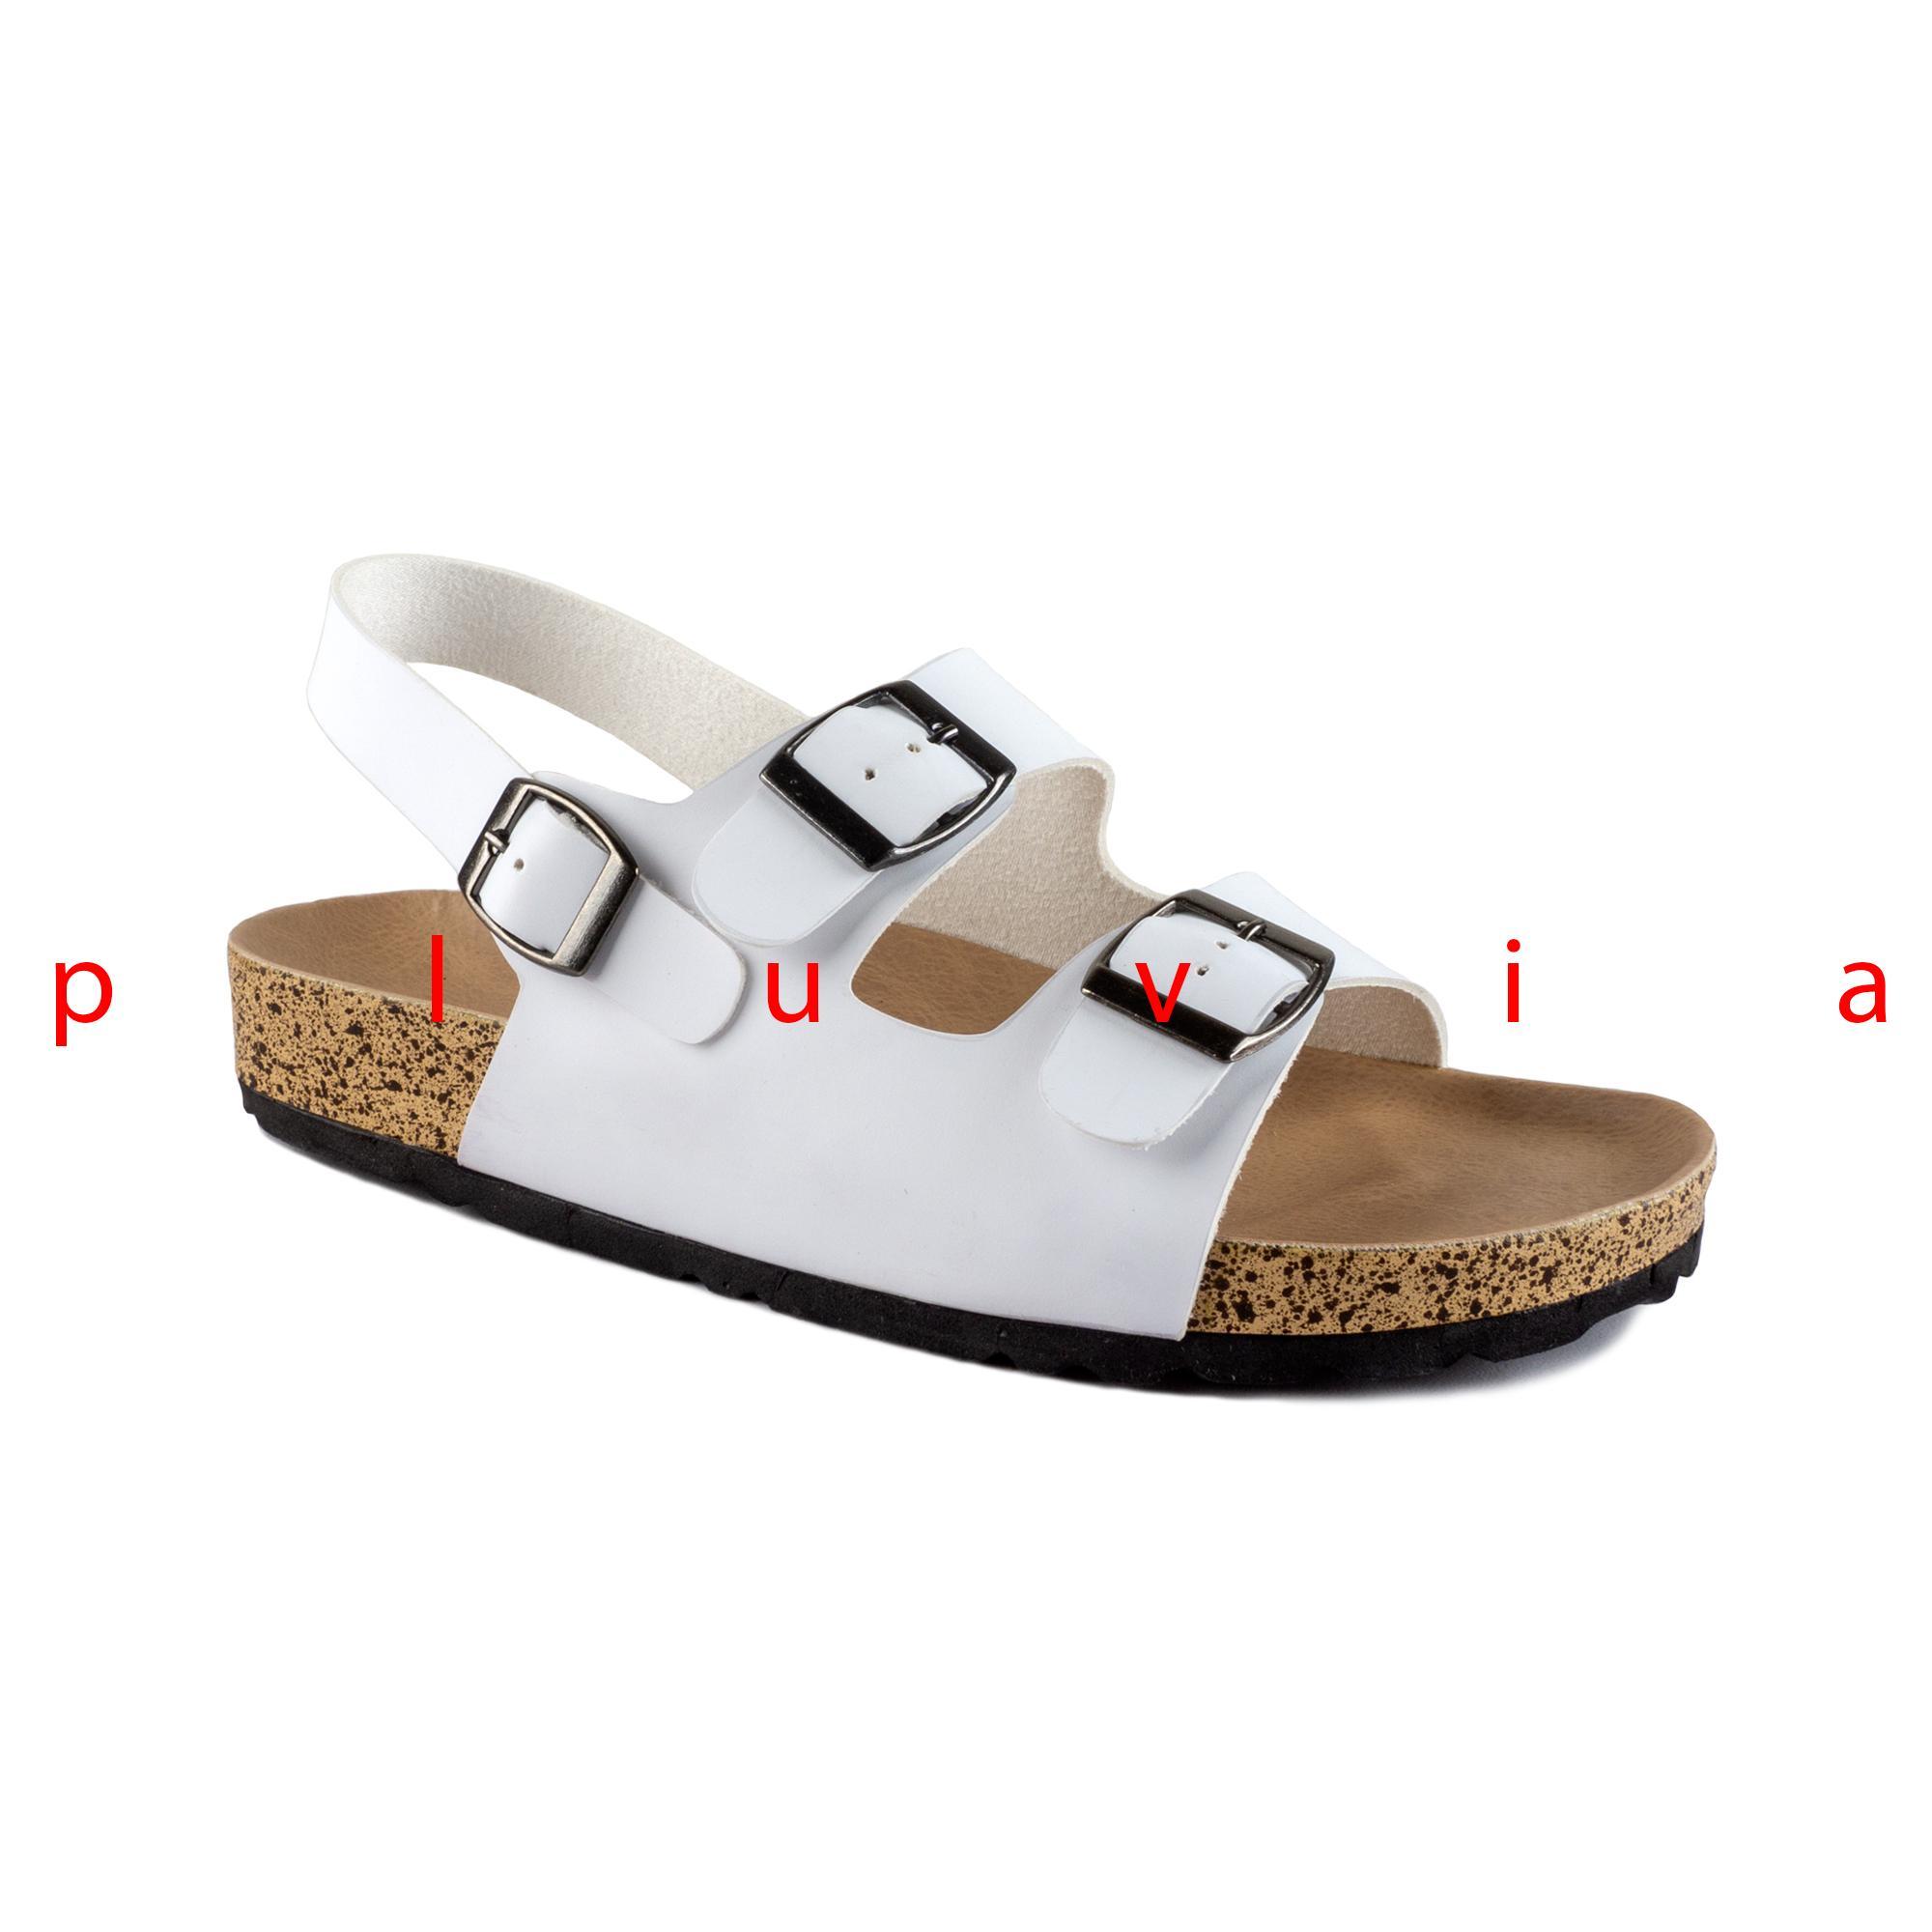 Pluvia - Sandal Wanita Sendal Flat Footbed JENIA - Putih / Hitam / Camel - 2